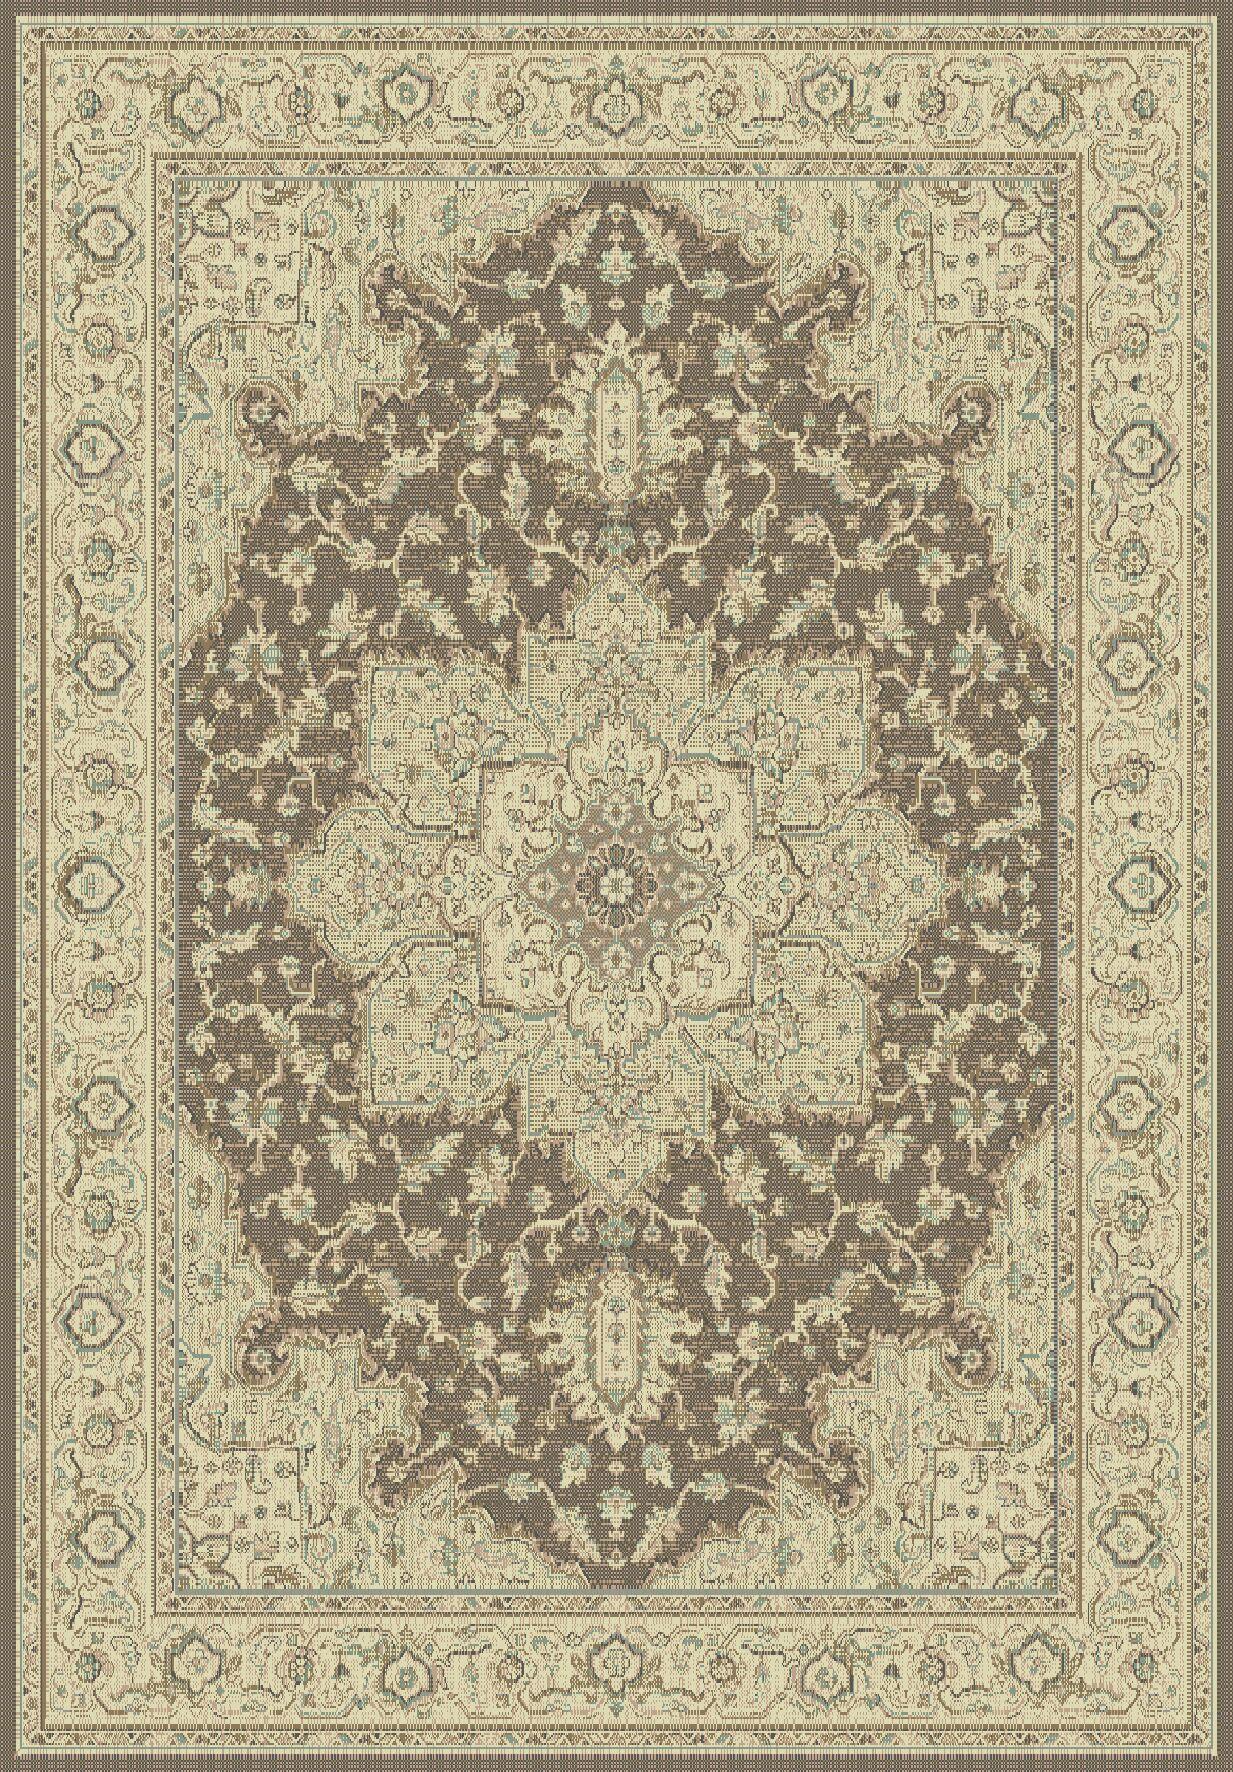 Manor Brown/Cream Area Rug Rug Size: Rectangle 3'10